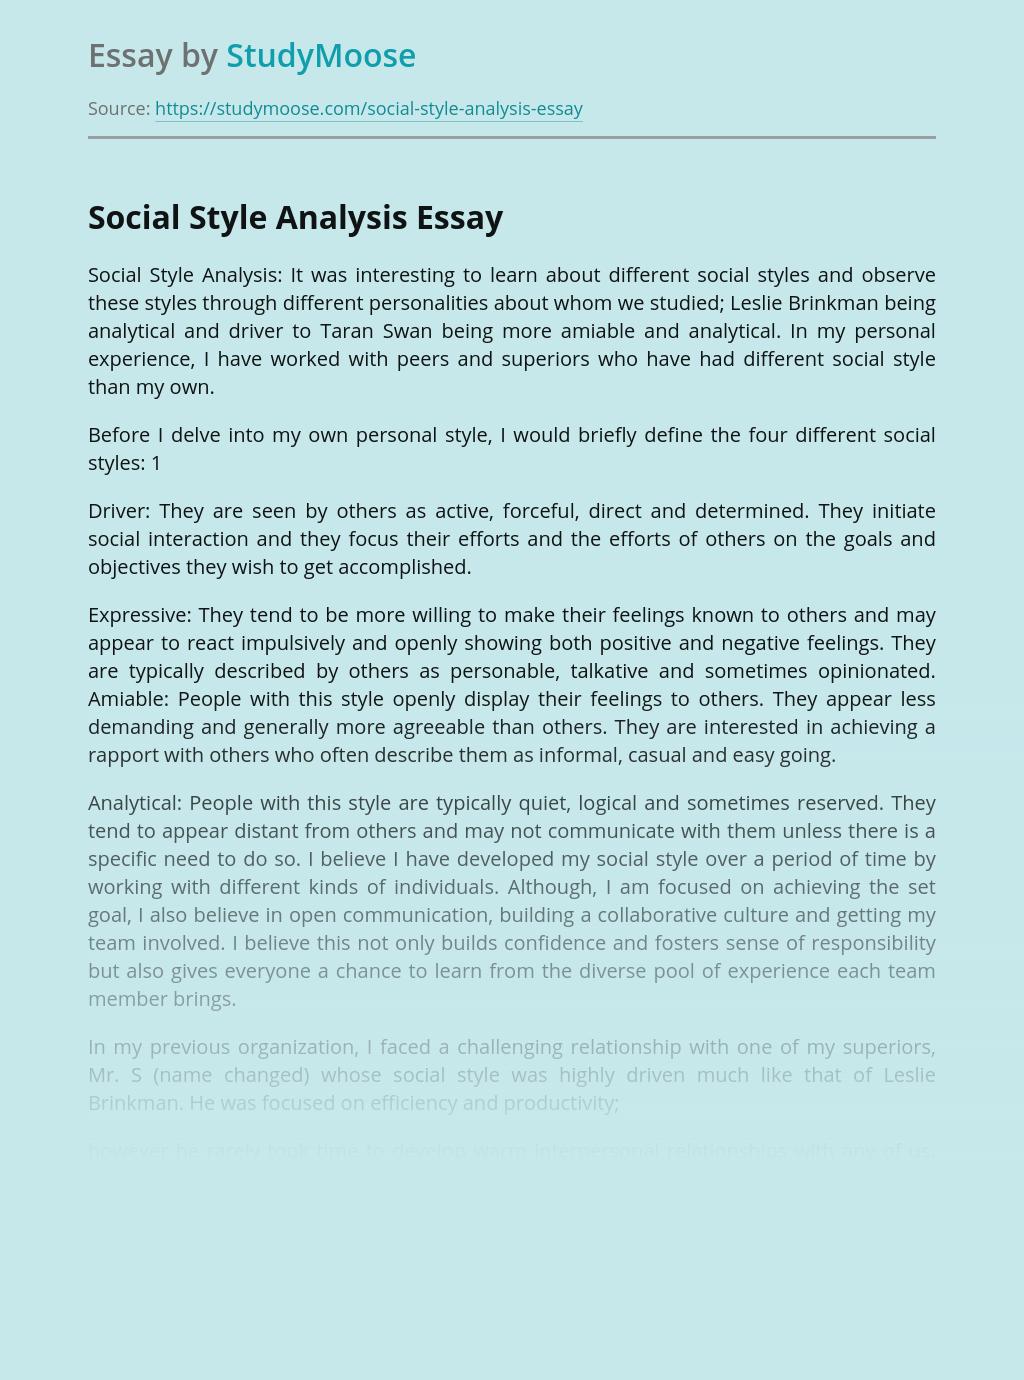 Social Style Analysis